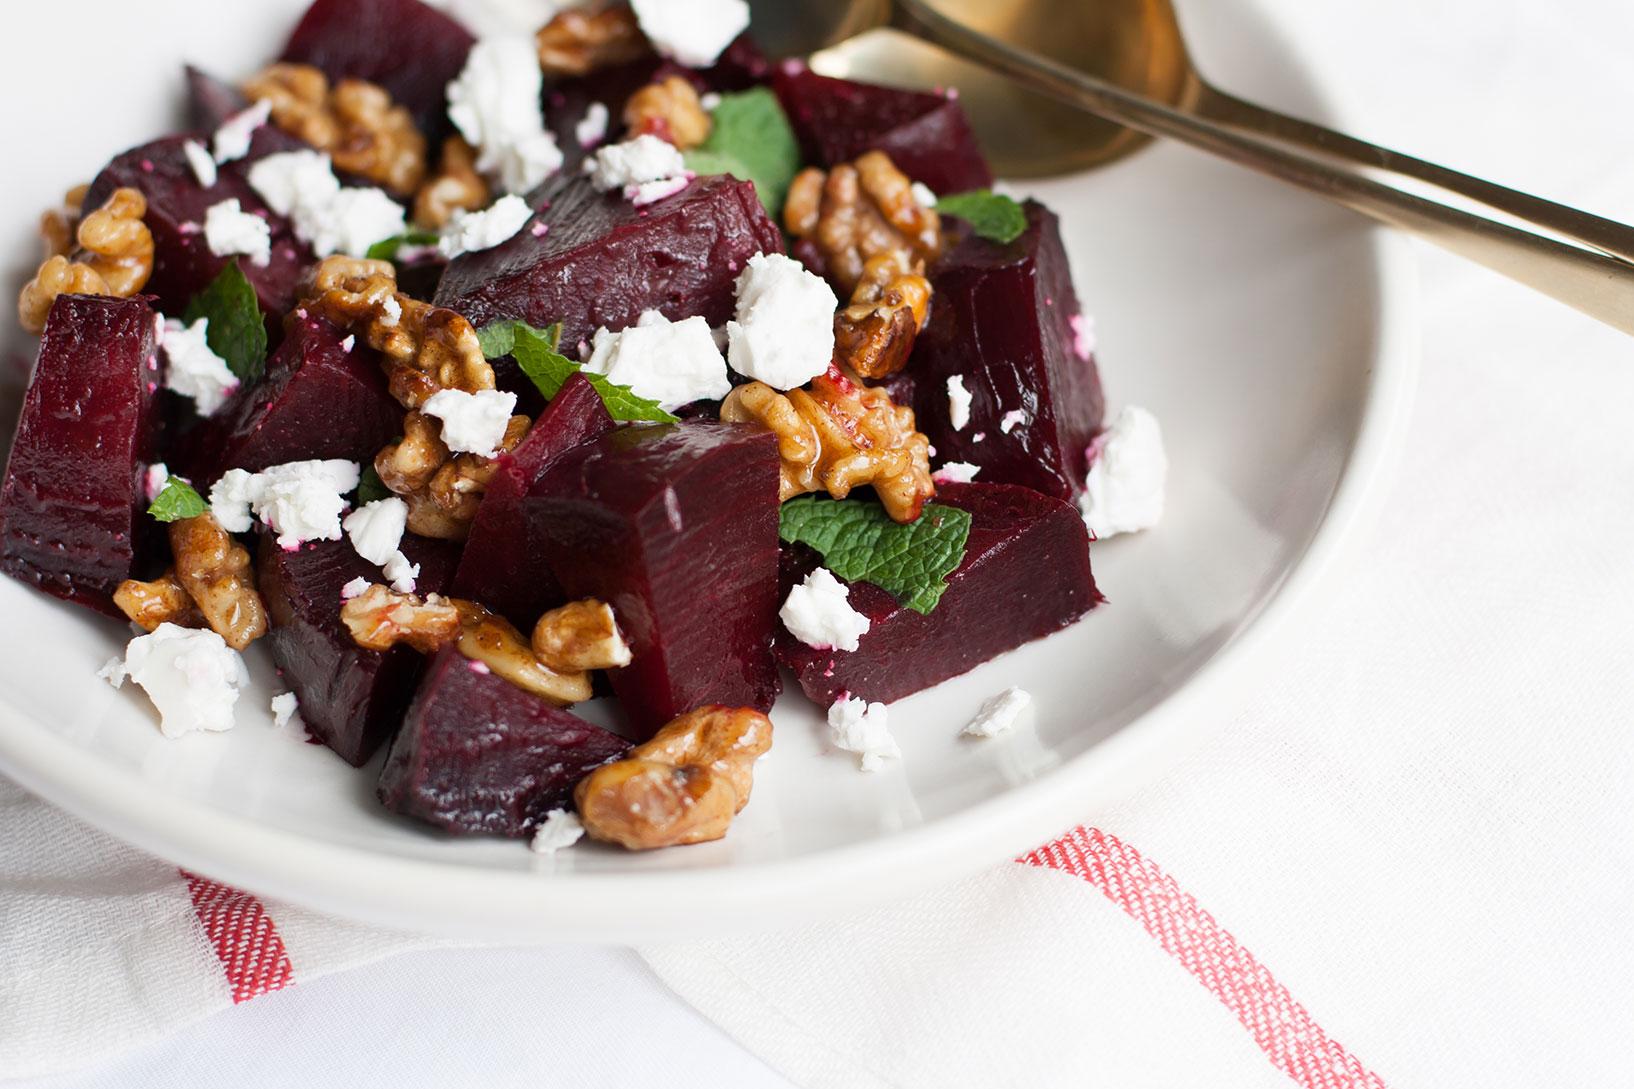 beetroot salad close up